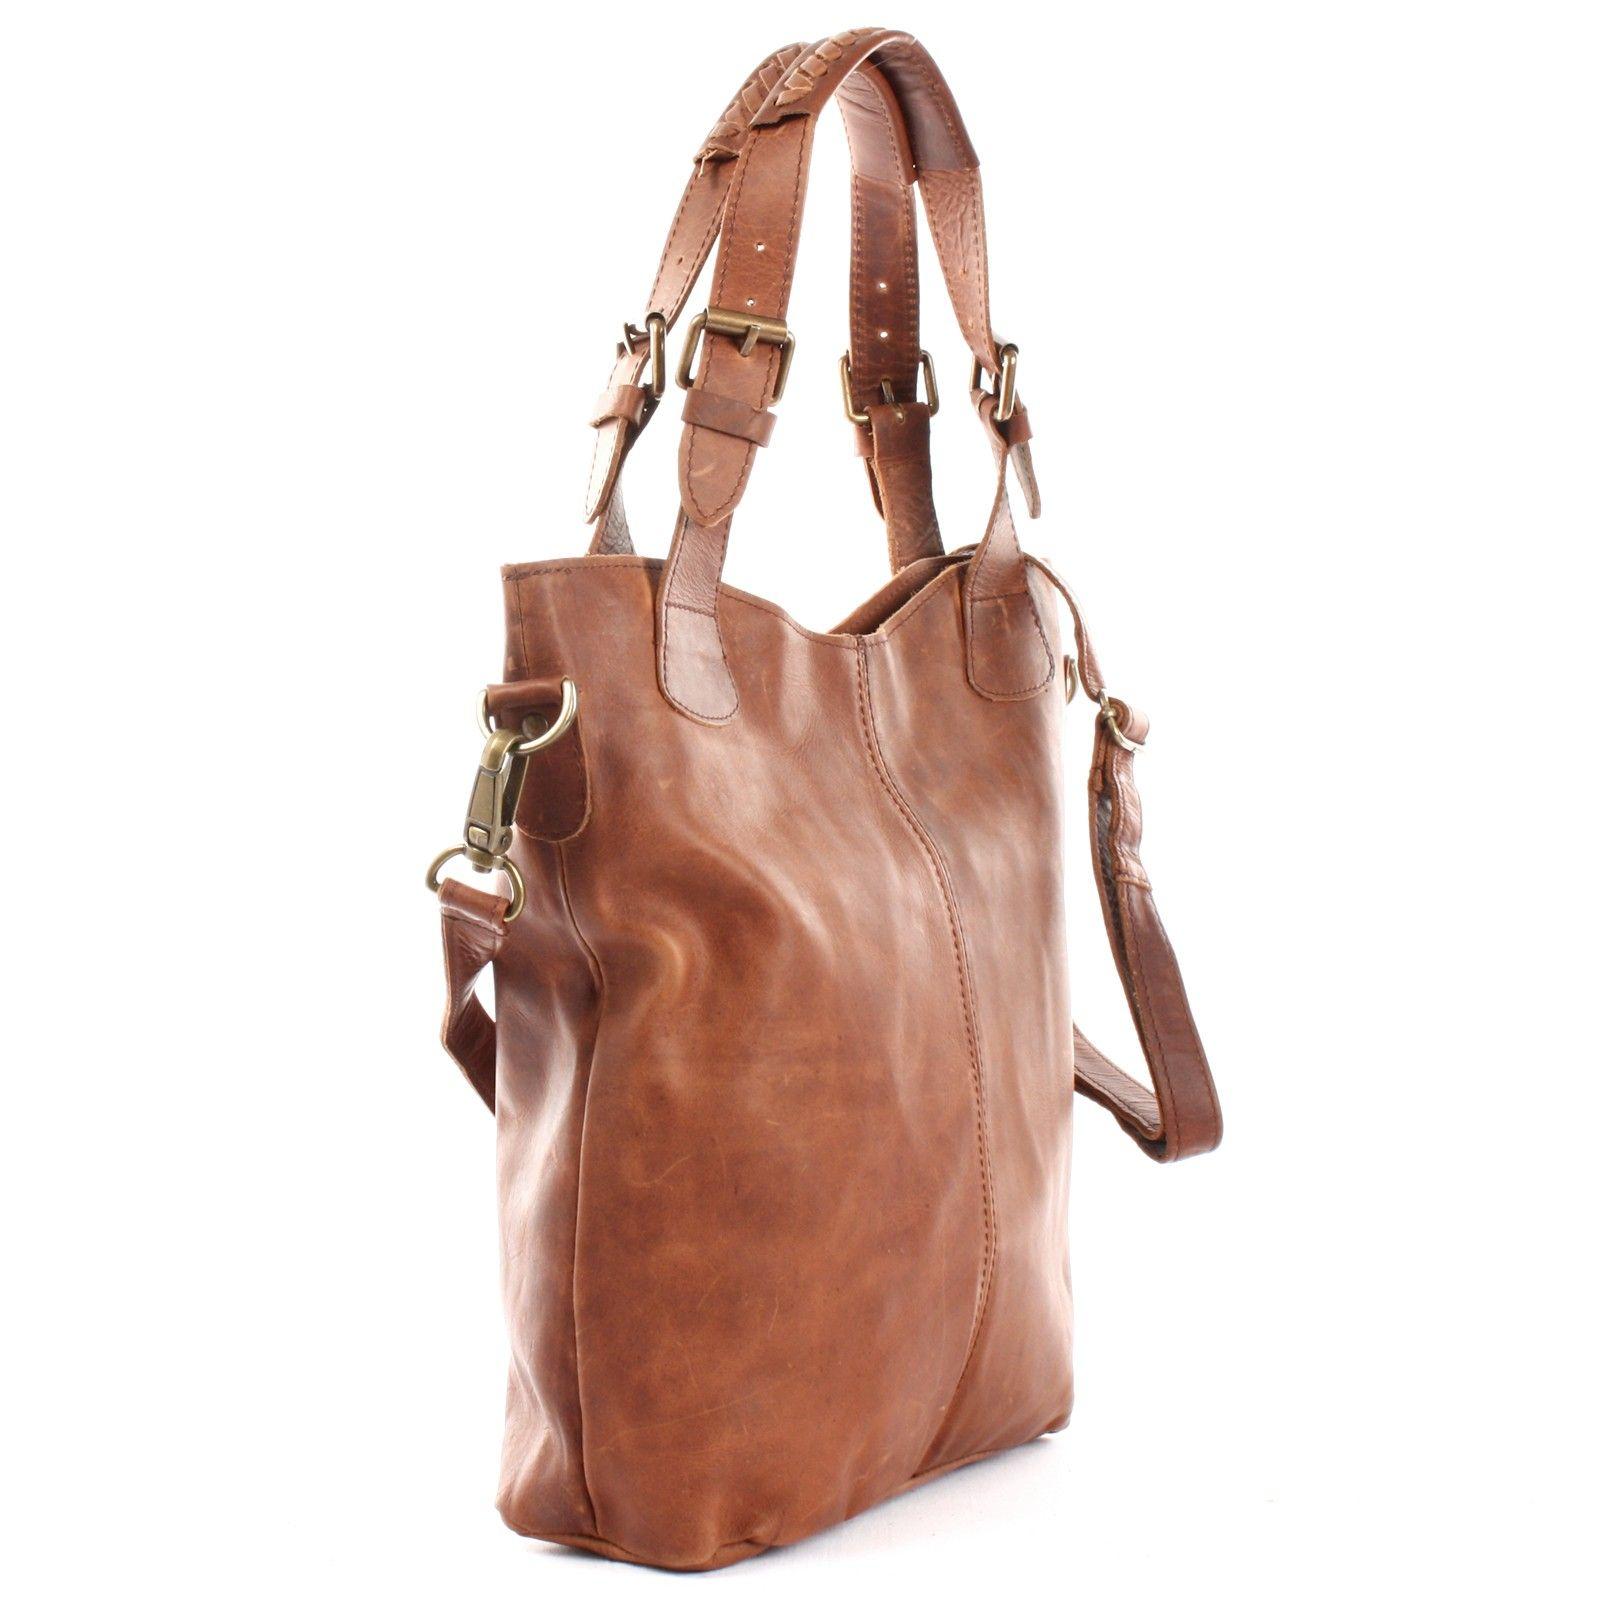 daddc565ea0742 Umhängetasche Shopper Leder braun LE0054 | Mode: Handtaschen ...